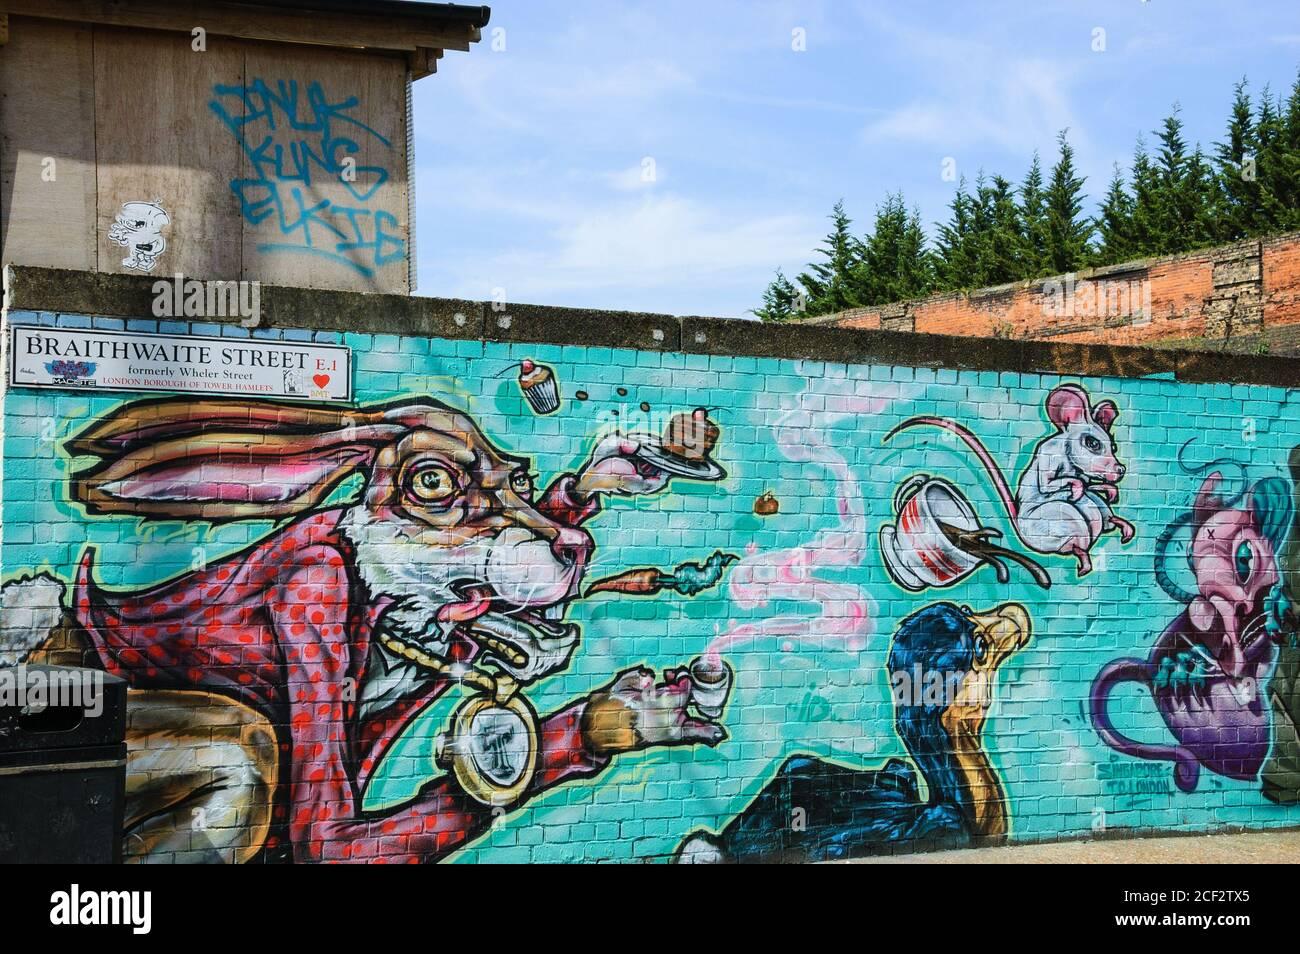 LONDON, ENGLAND, UK - MAY 4, 2014: Graffiti illustration for Alice in Wonderland on the wall in Brick Lane area. Urban art Stock Photo